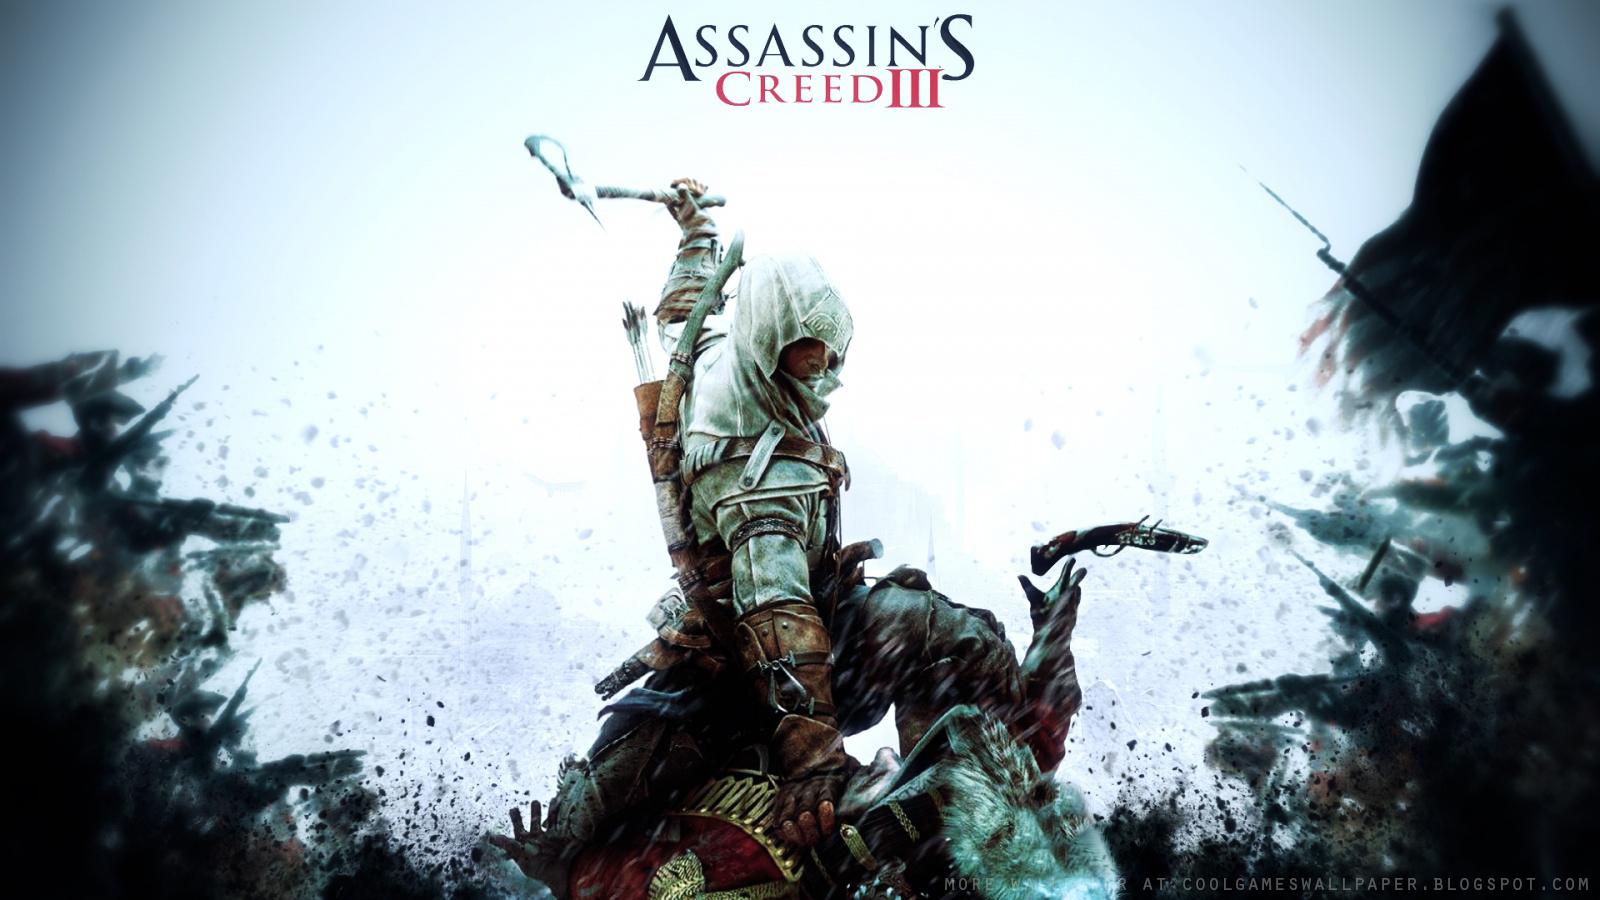 assassin's creed 3 wallpaper 2 - cool games wallpaper